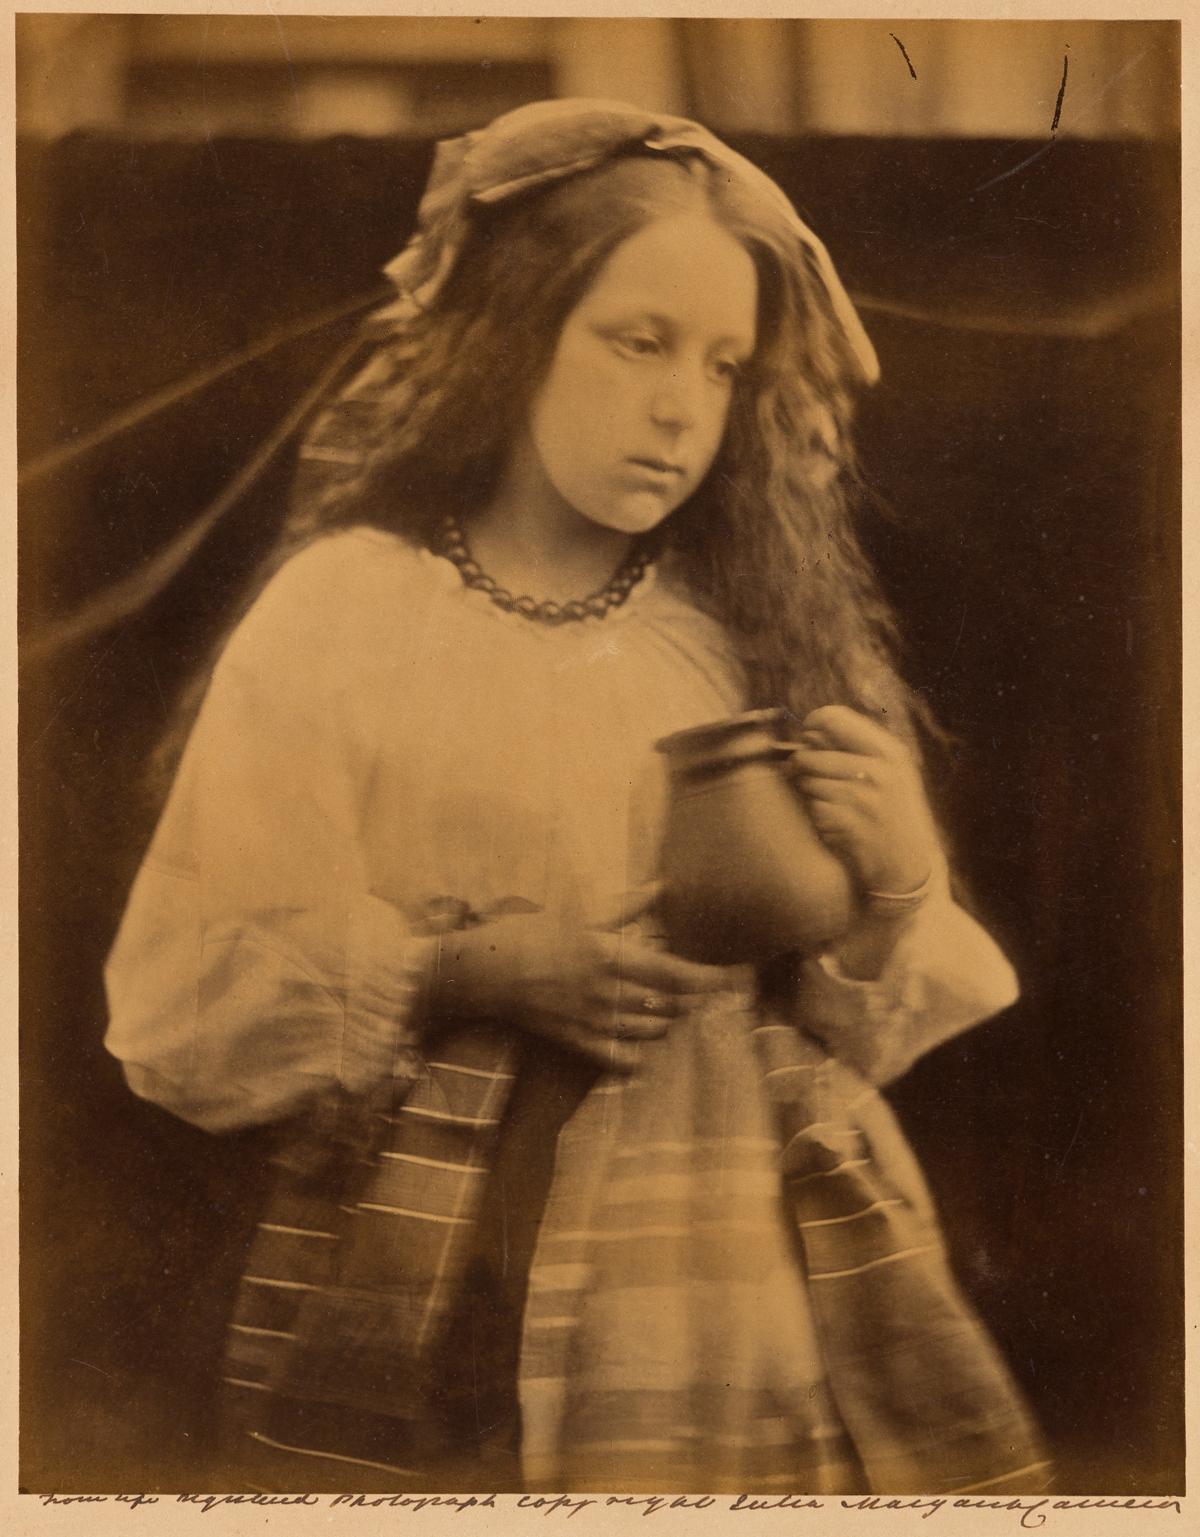 JULIA MARGARET CAMERON (1815-1879) La Contadina, girl with jar.